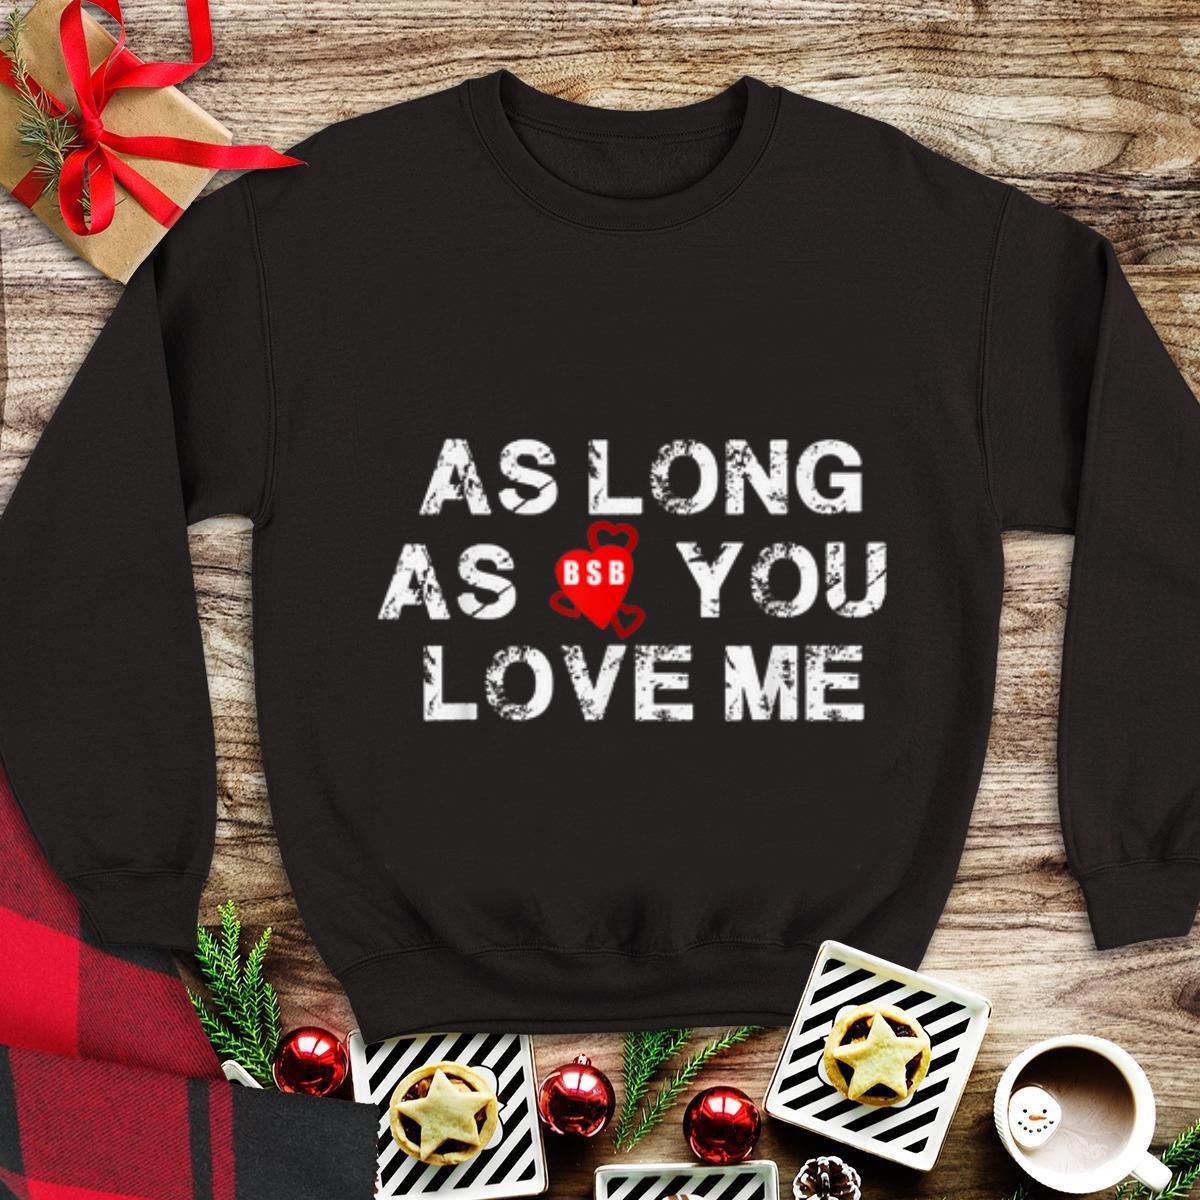 Backstreet Boys Christmas Sweater.Official Backstreet Boys Back Again As Long As You Love Me Shirt